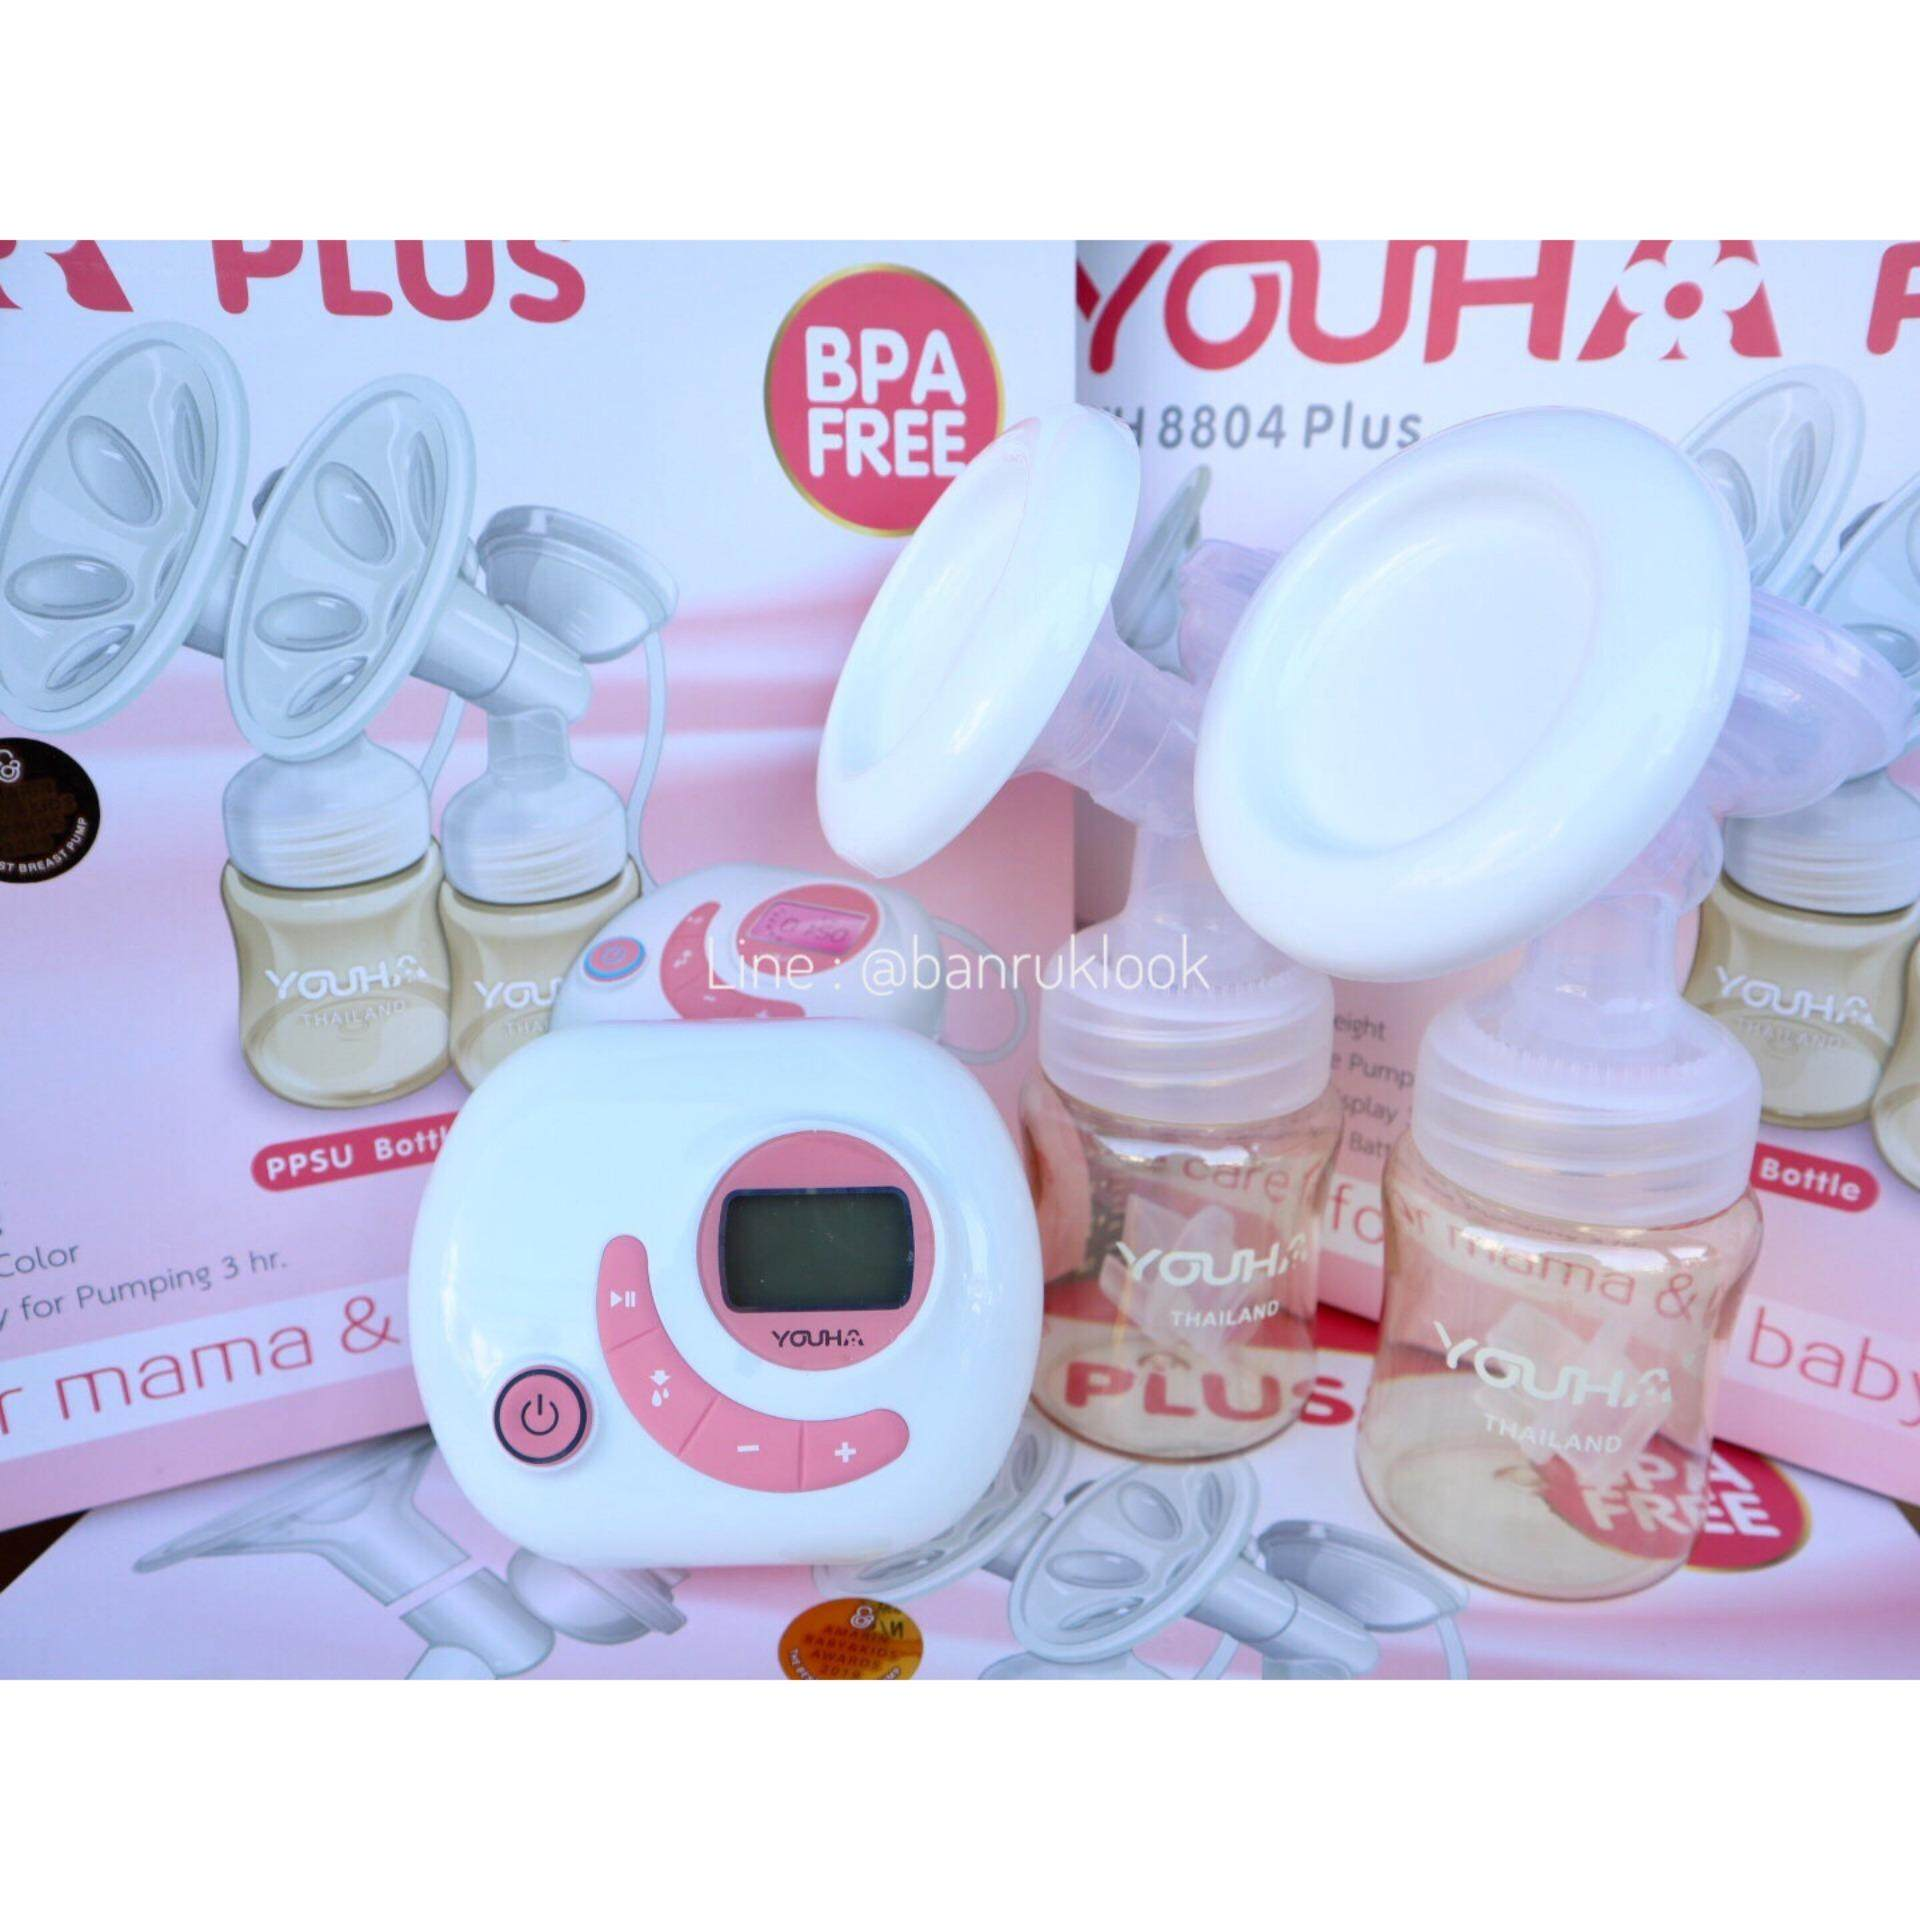 Youha Plus เครื่องปั๊มนมไฟฟ้าคู่ยูฮาพลัส รุ่น YH8804+(รับประกัน1ปี) สีชมพู